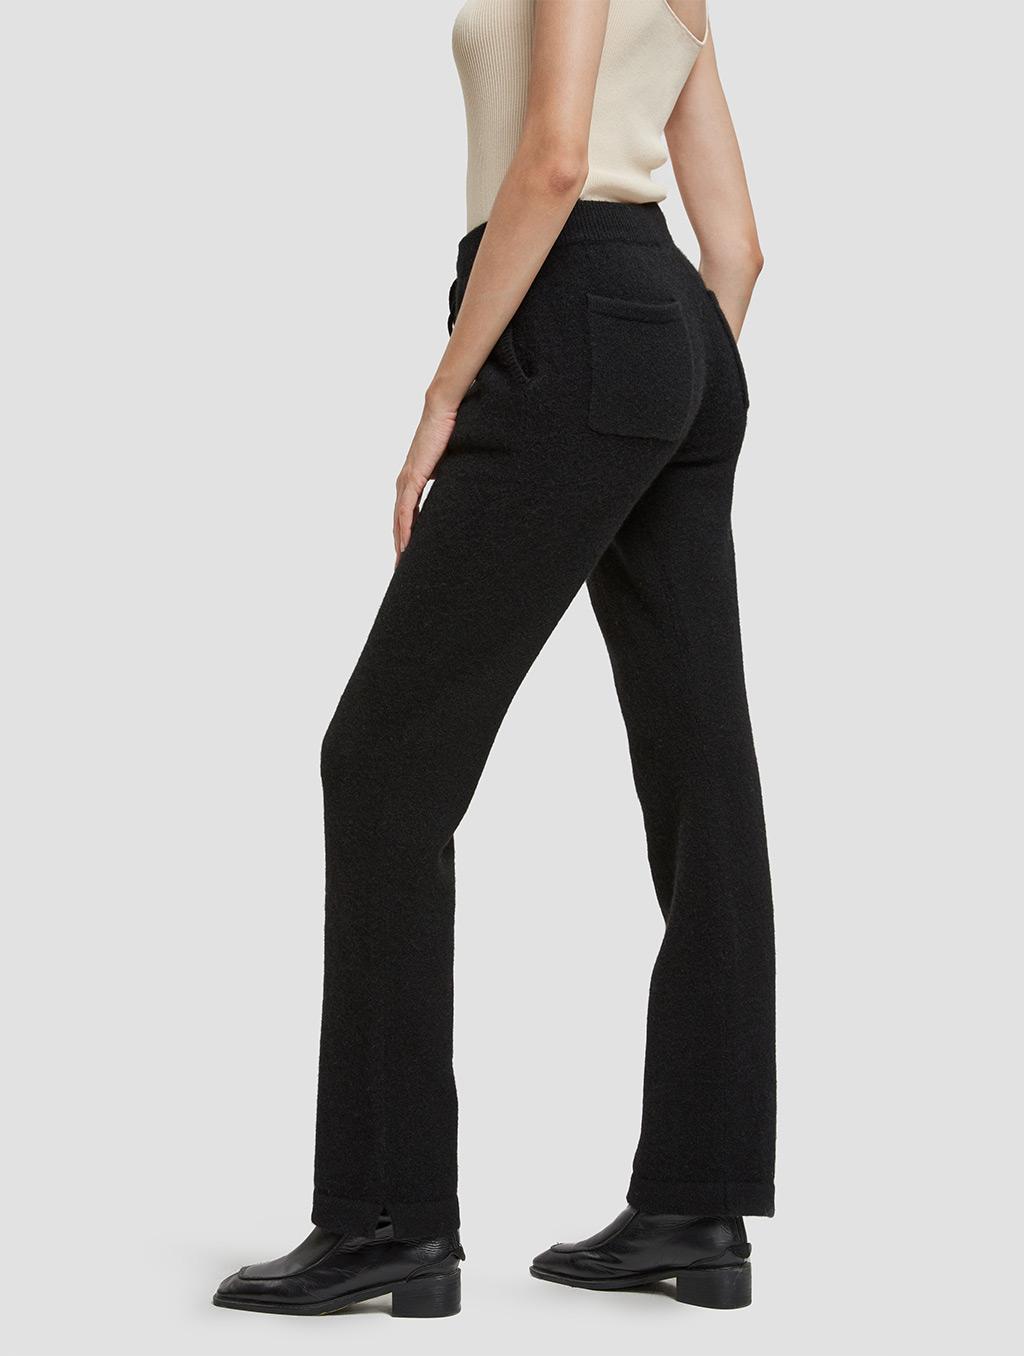 Drawstring straight yak wool pants-side-black